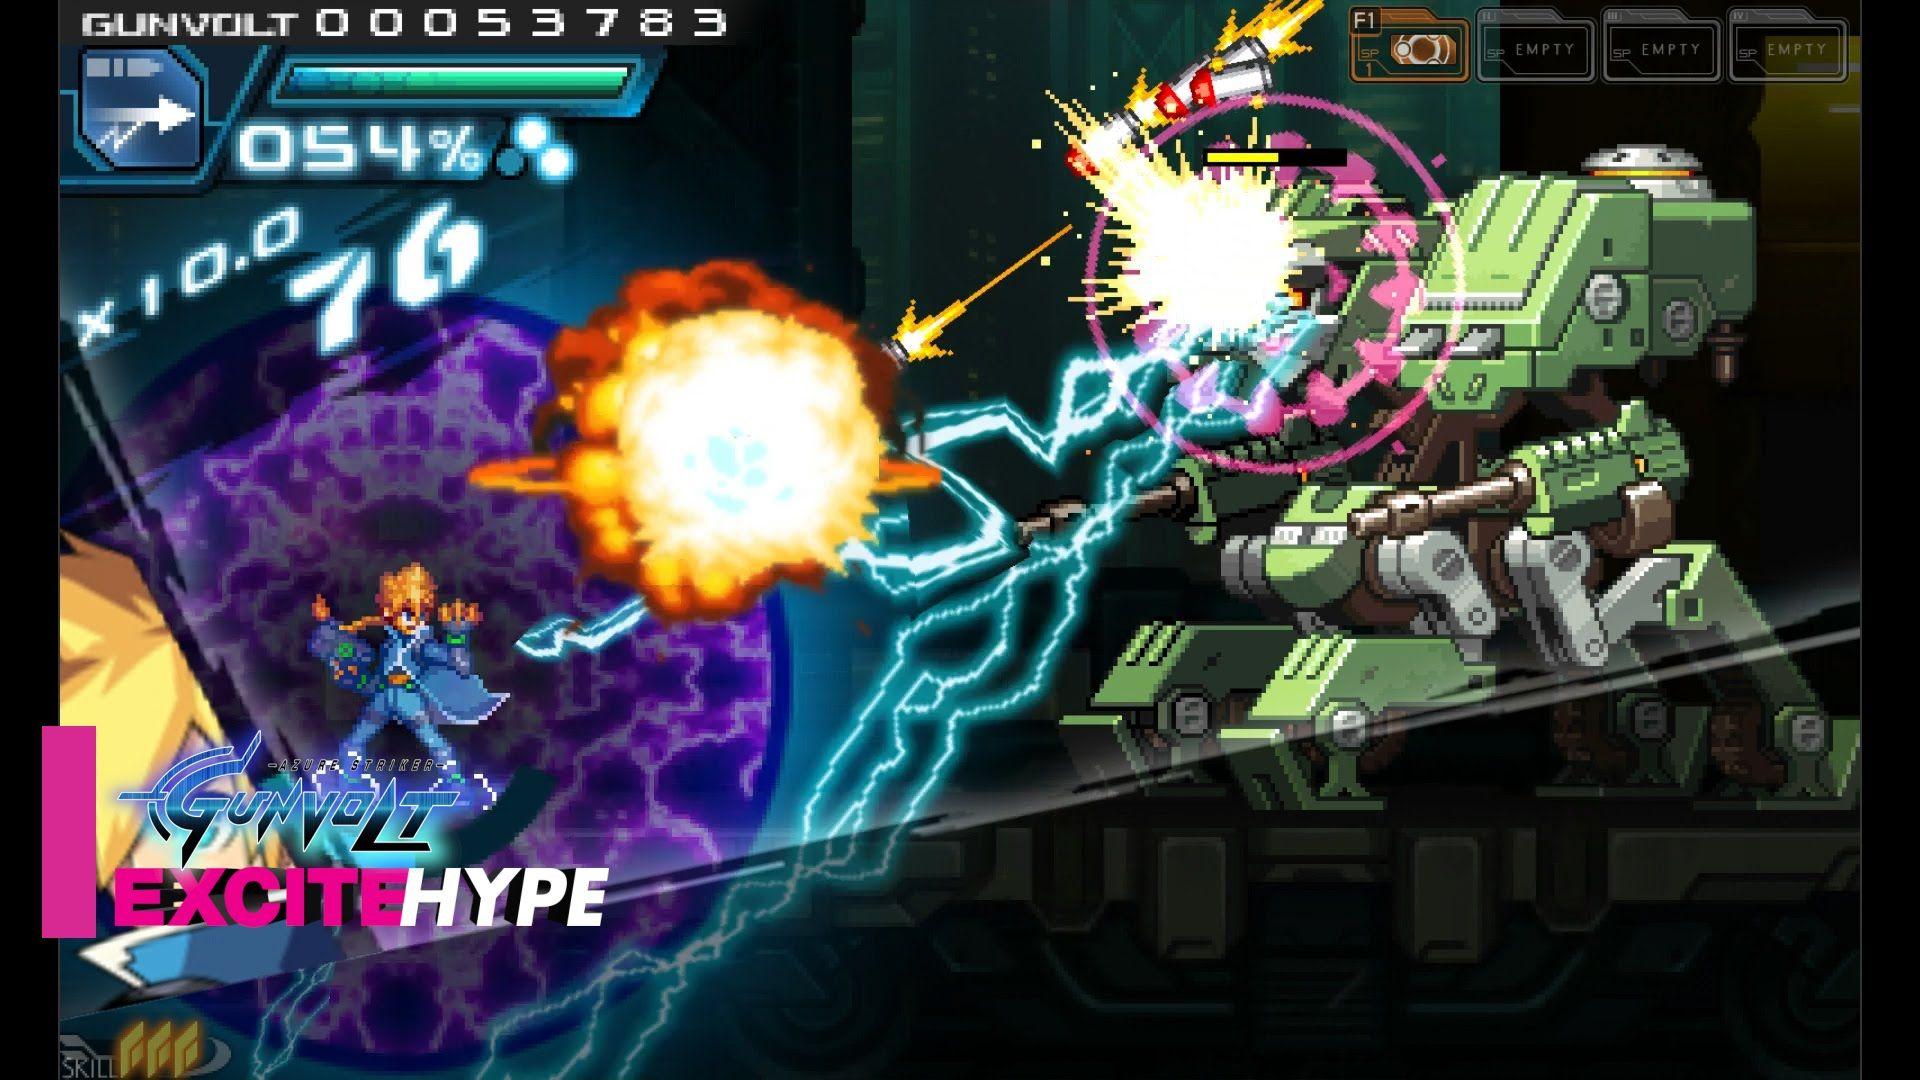 azure striker gunvolt pc nintendo 3ds steam version gameplay azure striker gunvolt nintendo 3ds azure